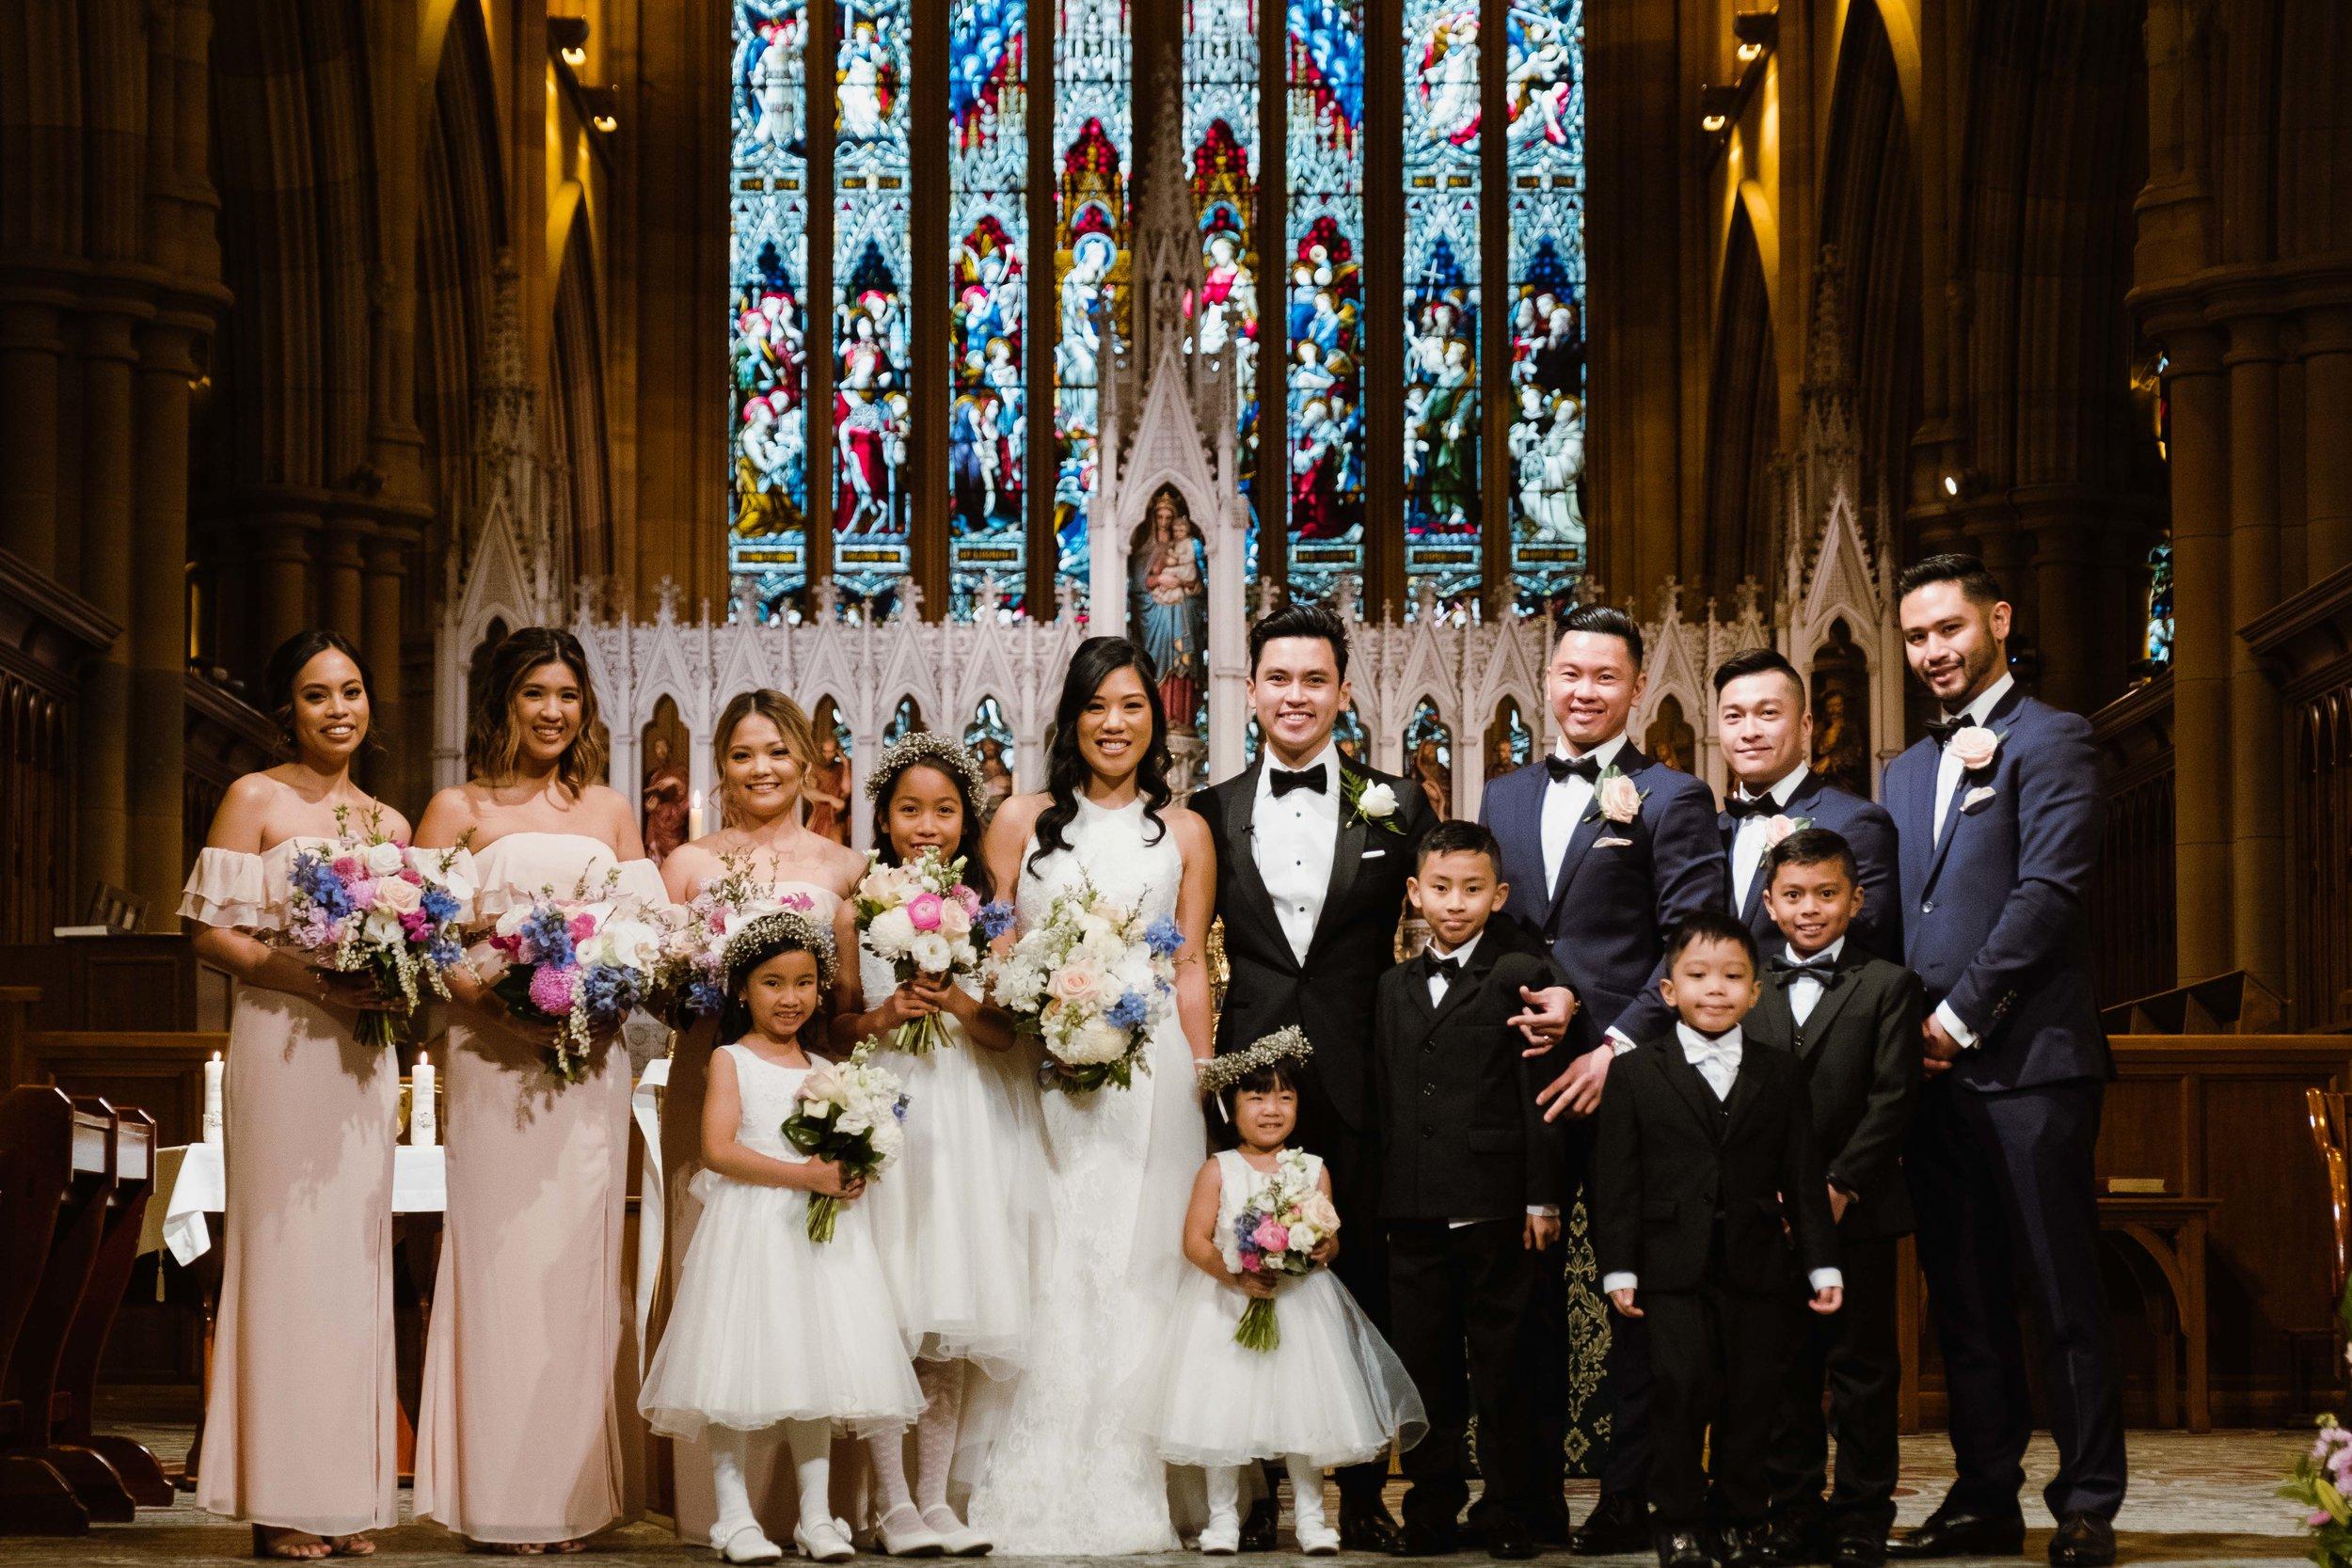 Maria and Gerald Sydney wedding by Milton Gan Photography 20.jpg